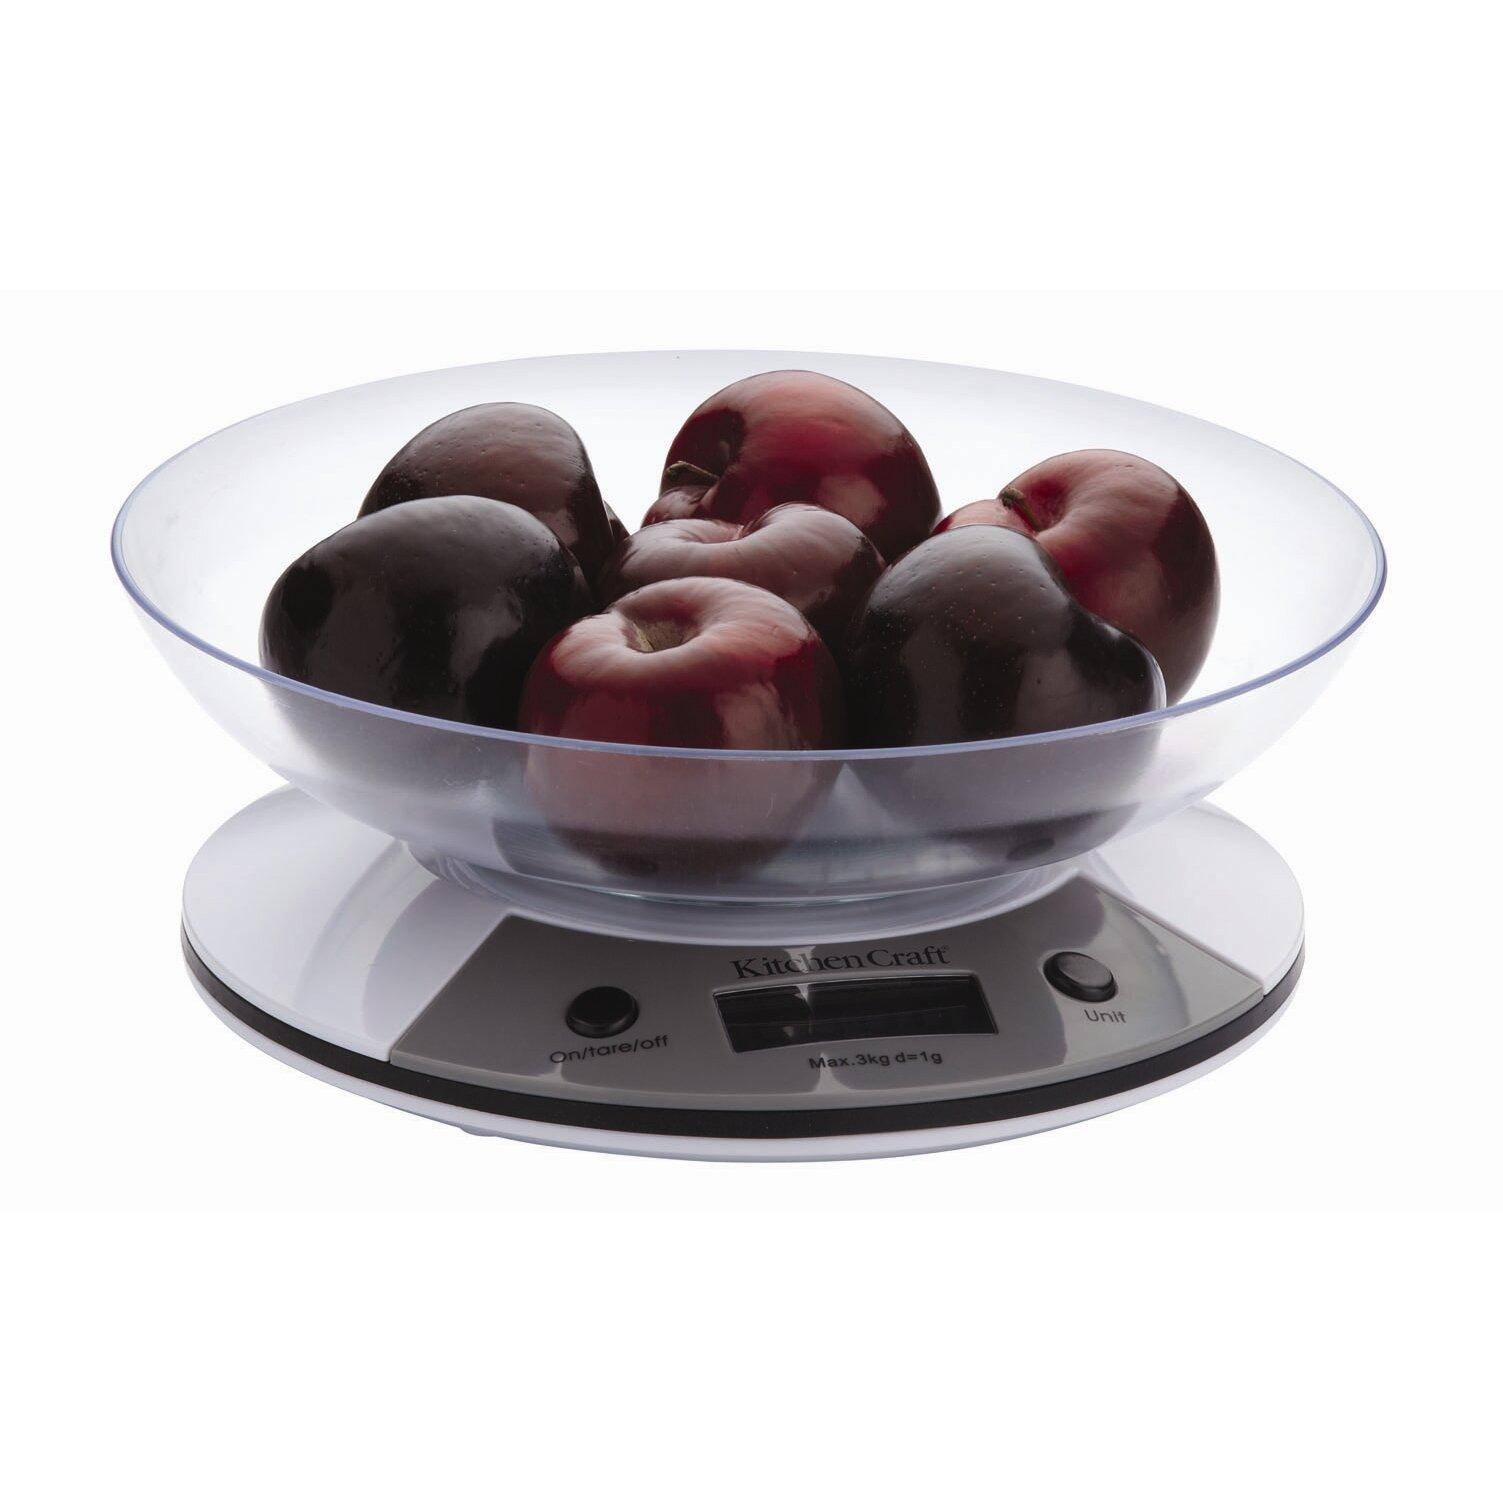 Digital Kitchen Scale Reviews Uk